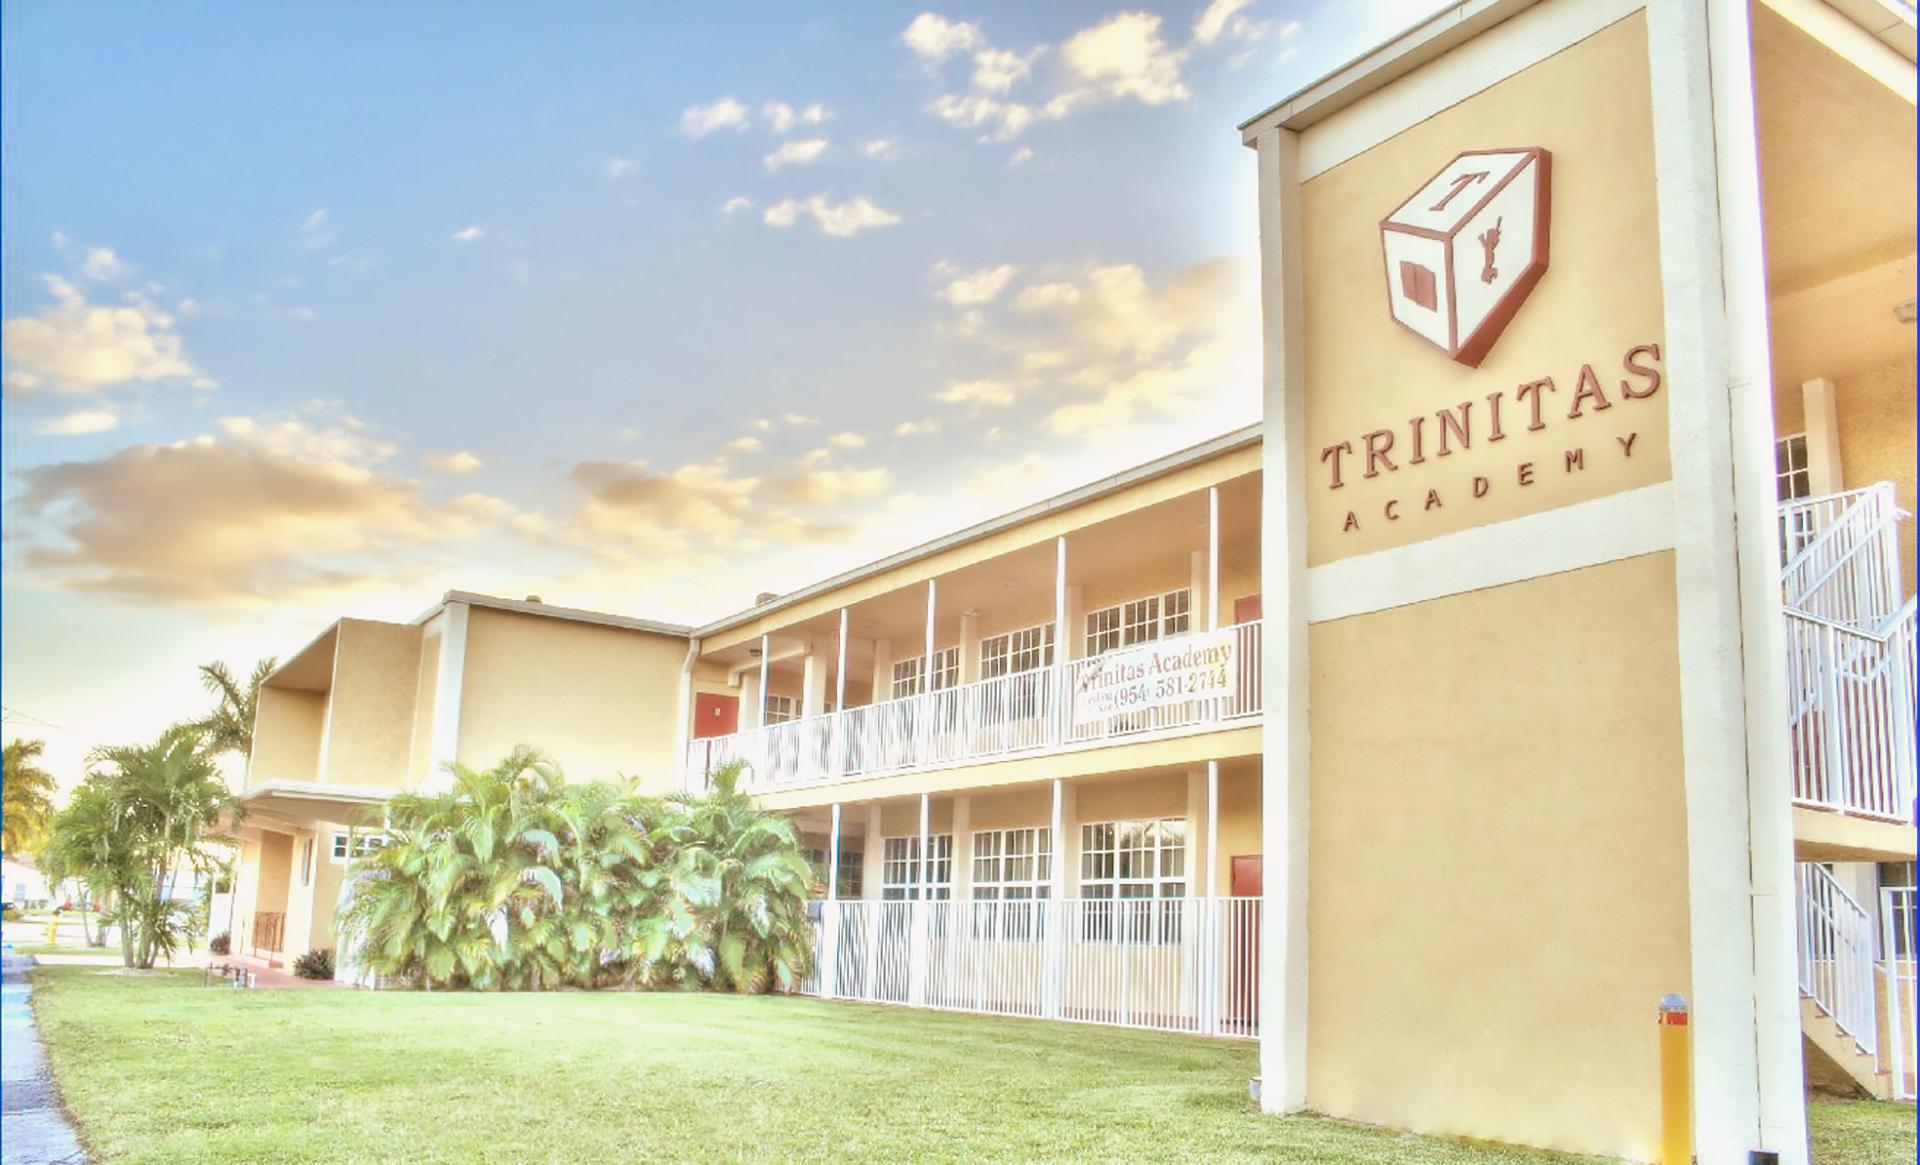 Trinitas Academy Plantation FL